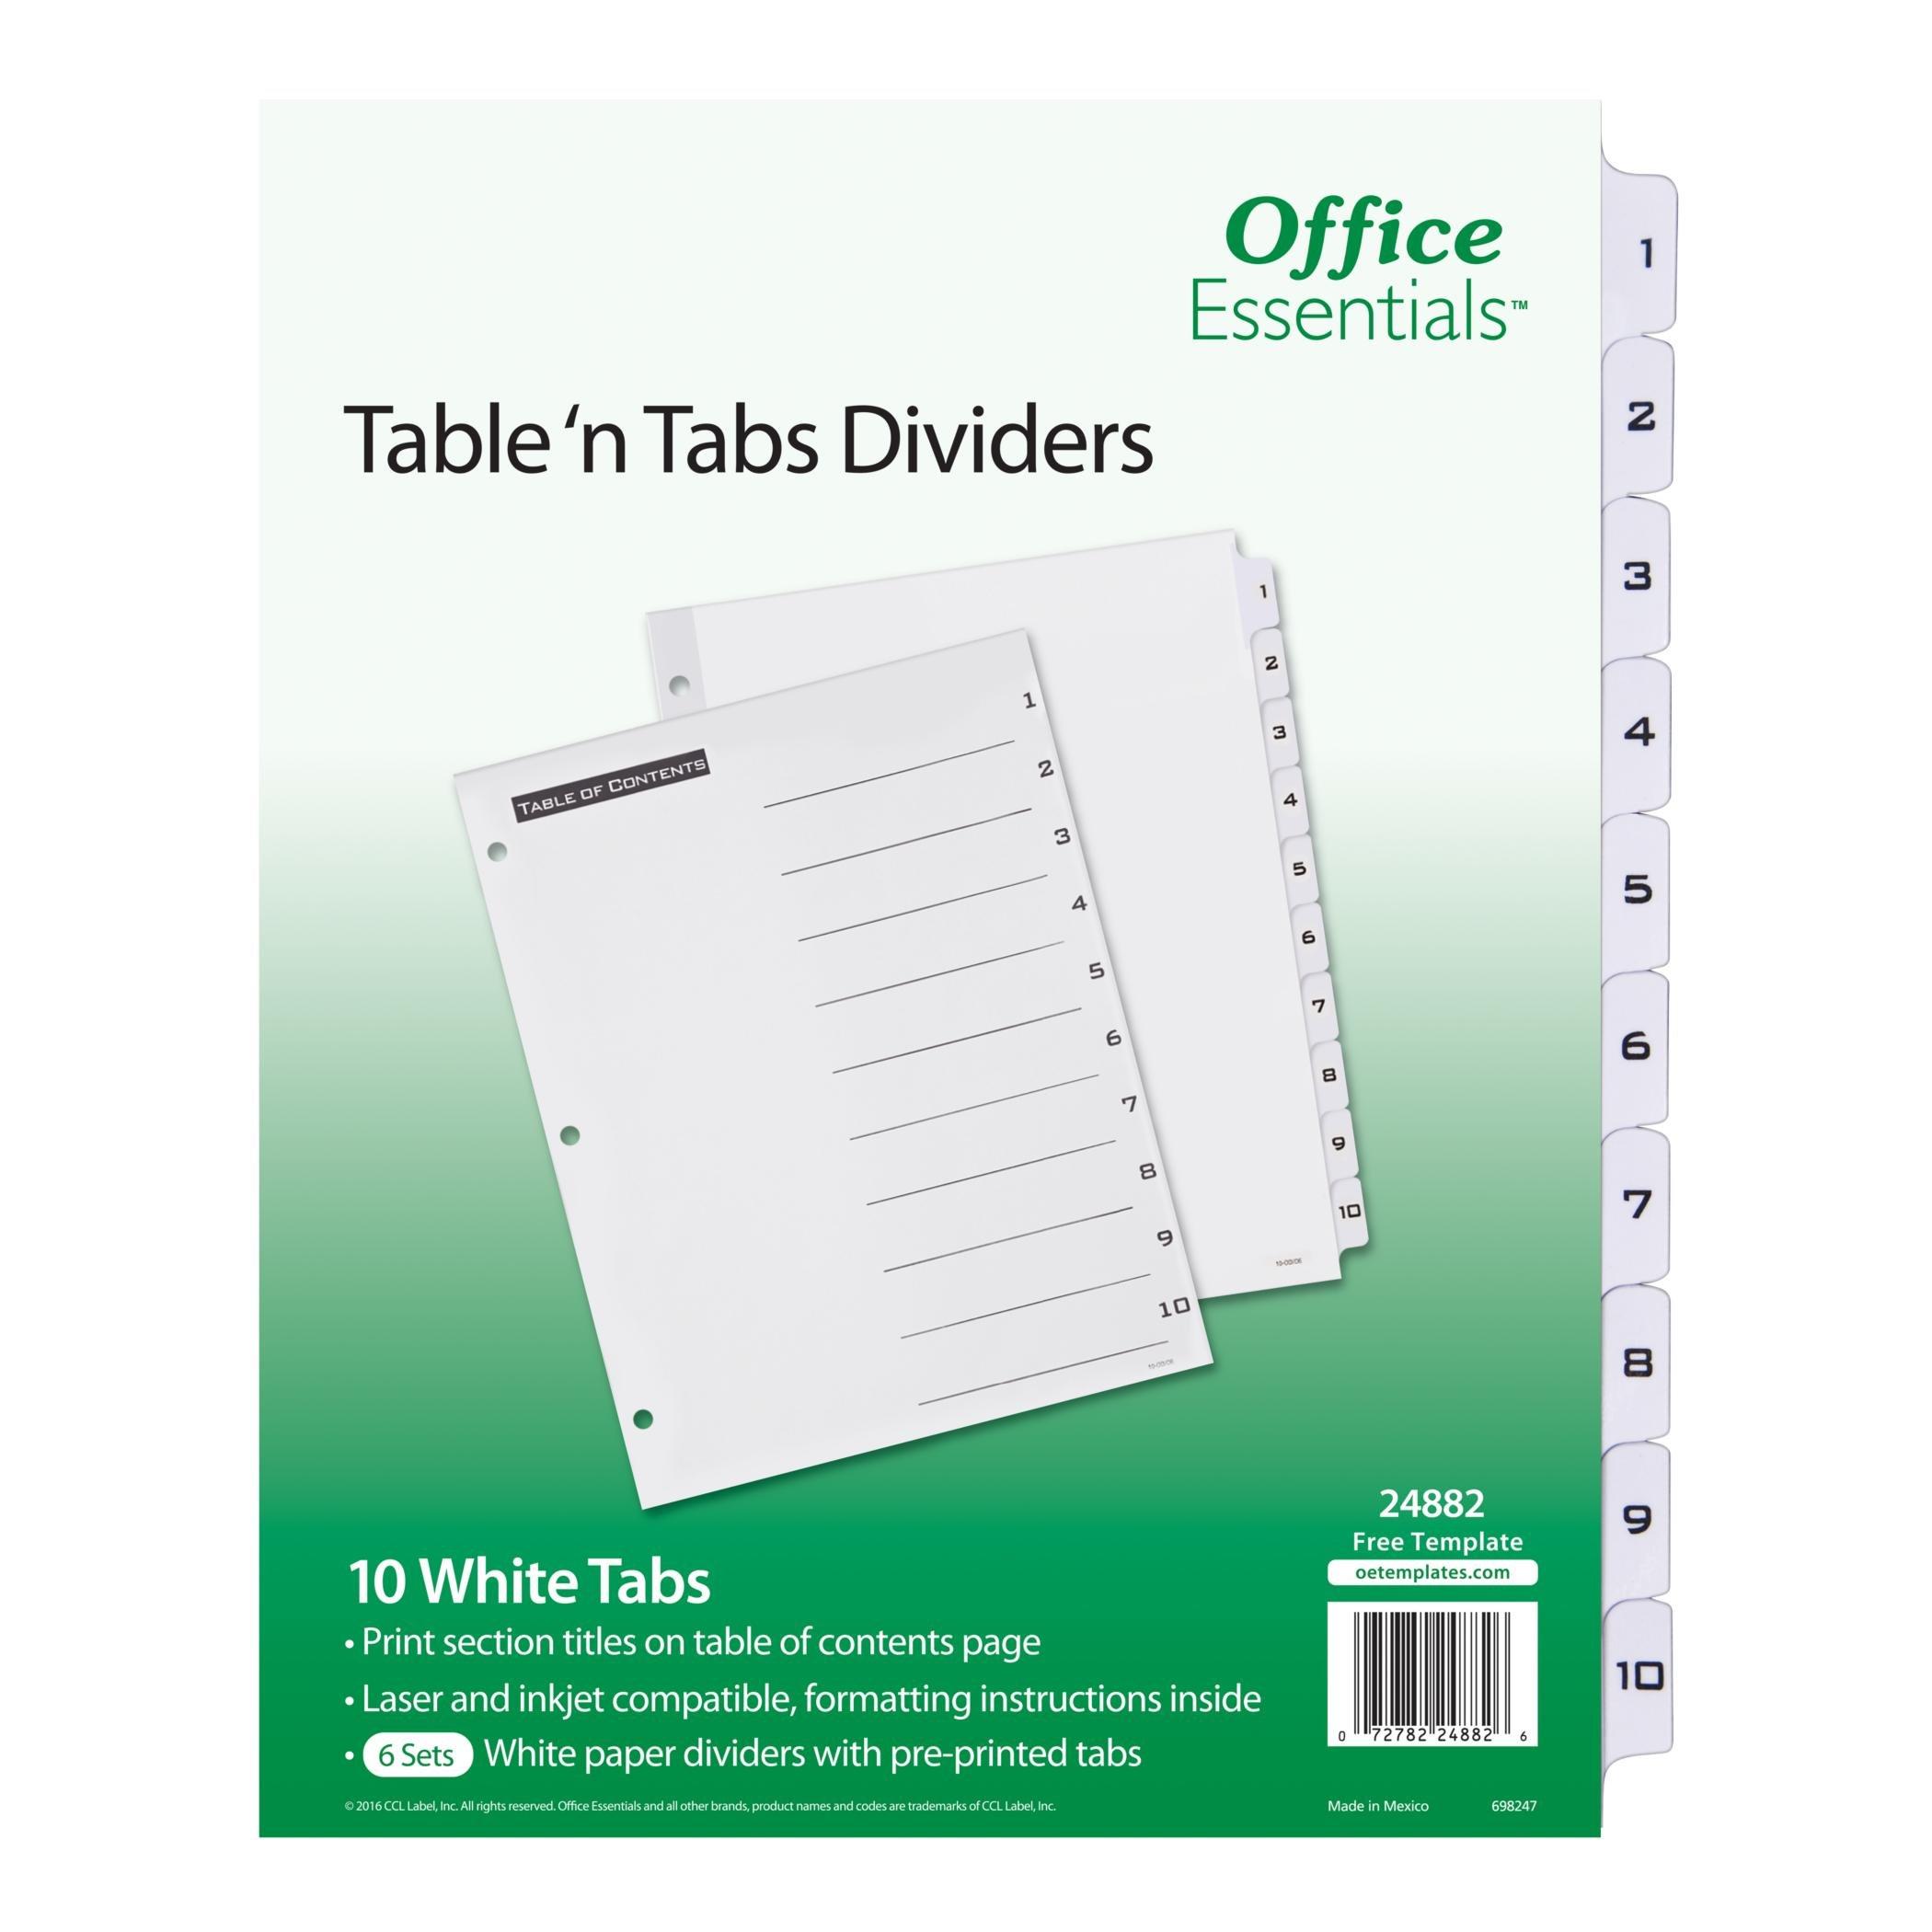 Office Essentials Table 'n Tabs Dividers, 8-1/2'' x 11'', 1-10 Tab, Black/White Tab, Laser/Inkjet, 6 Pk (24882)